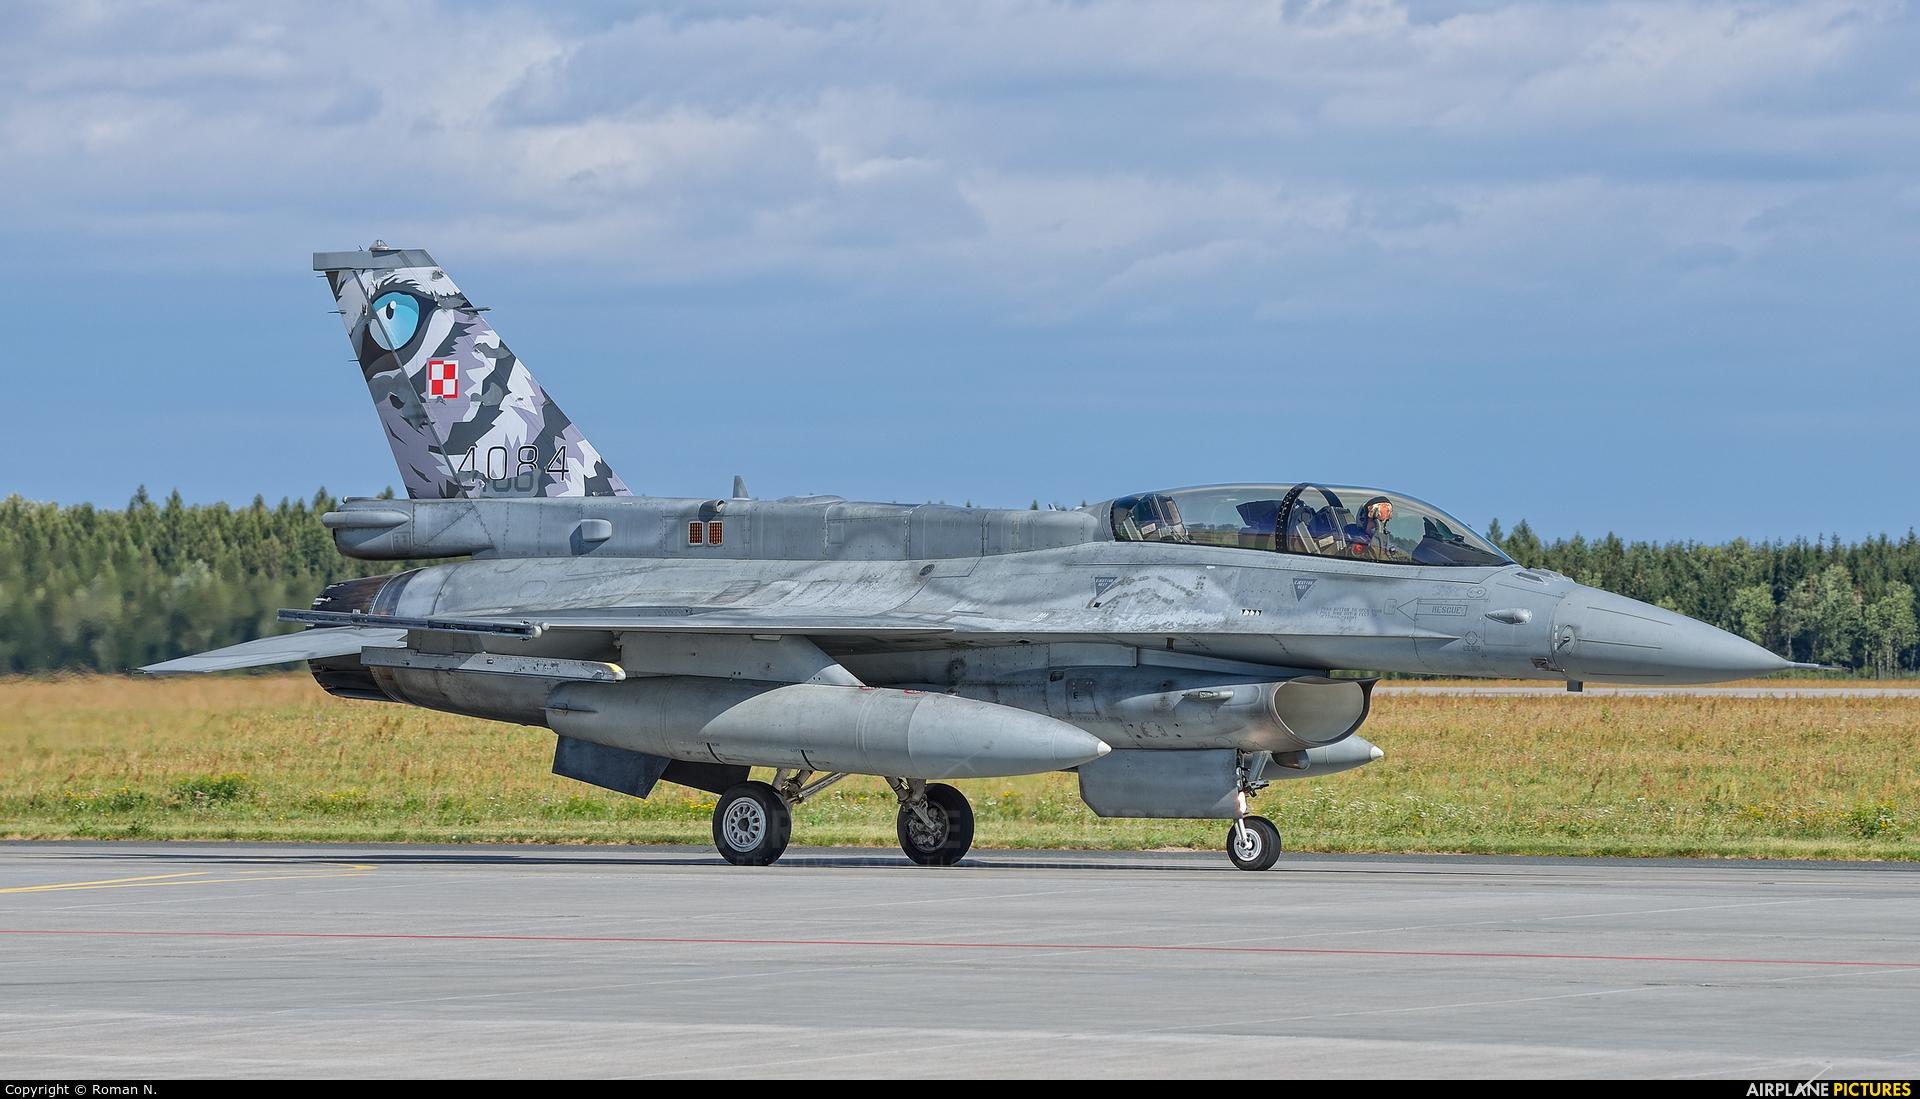 Poland - Air Force 4084 aircraft at Poznań - Krzesiny